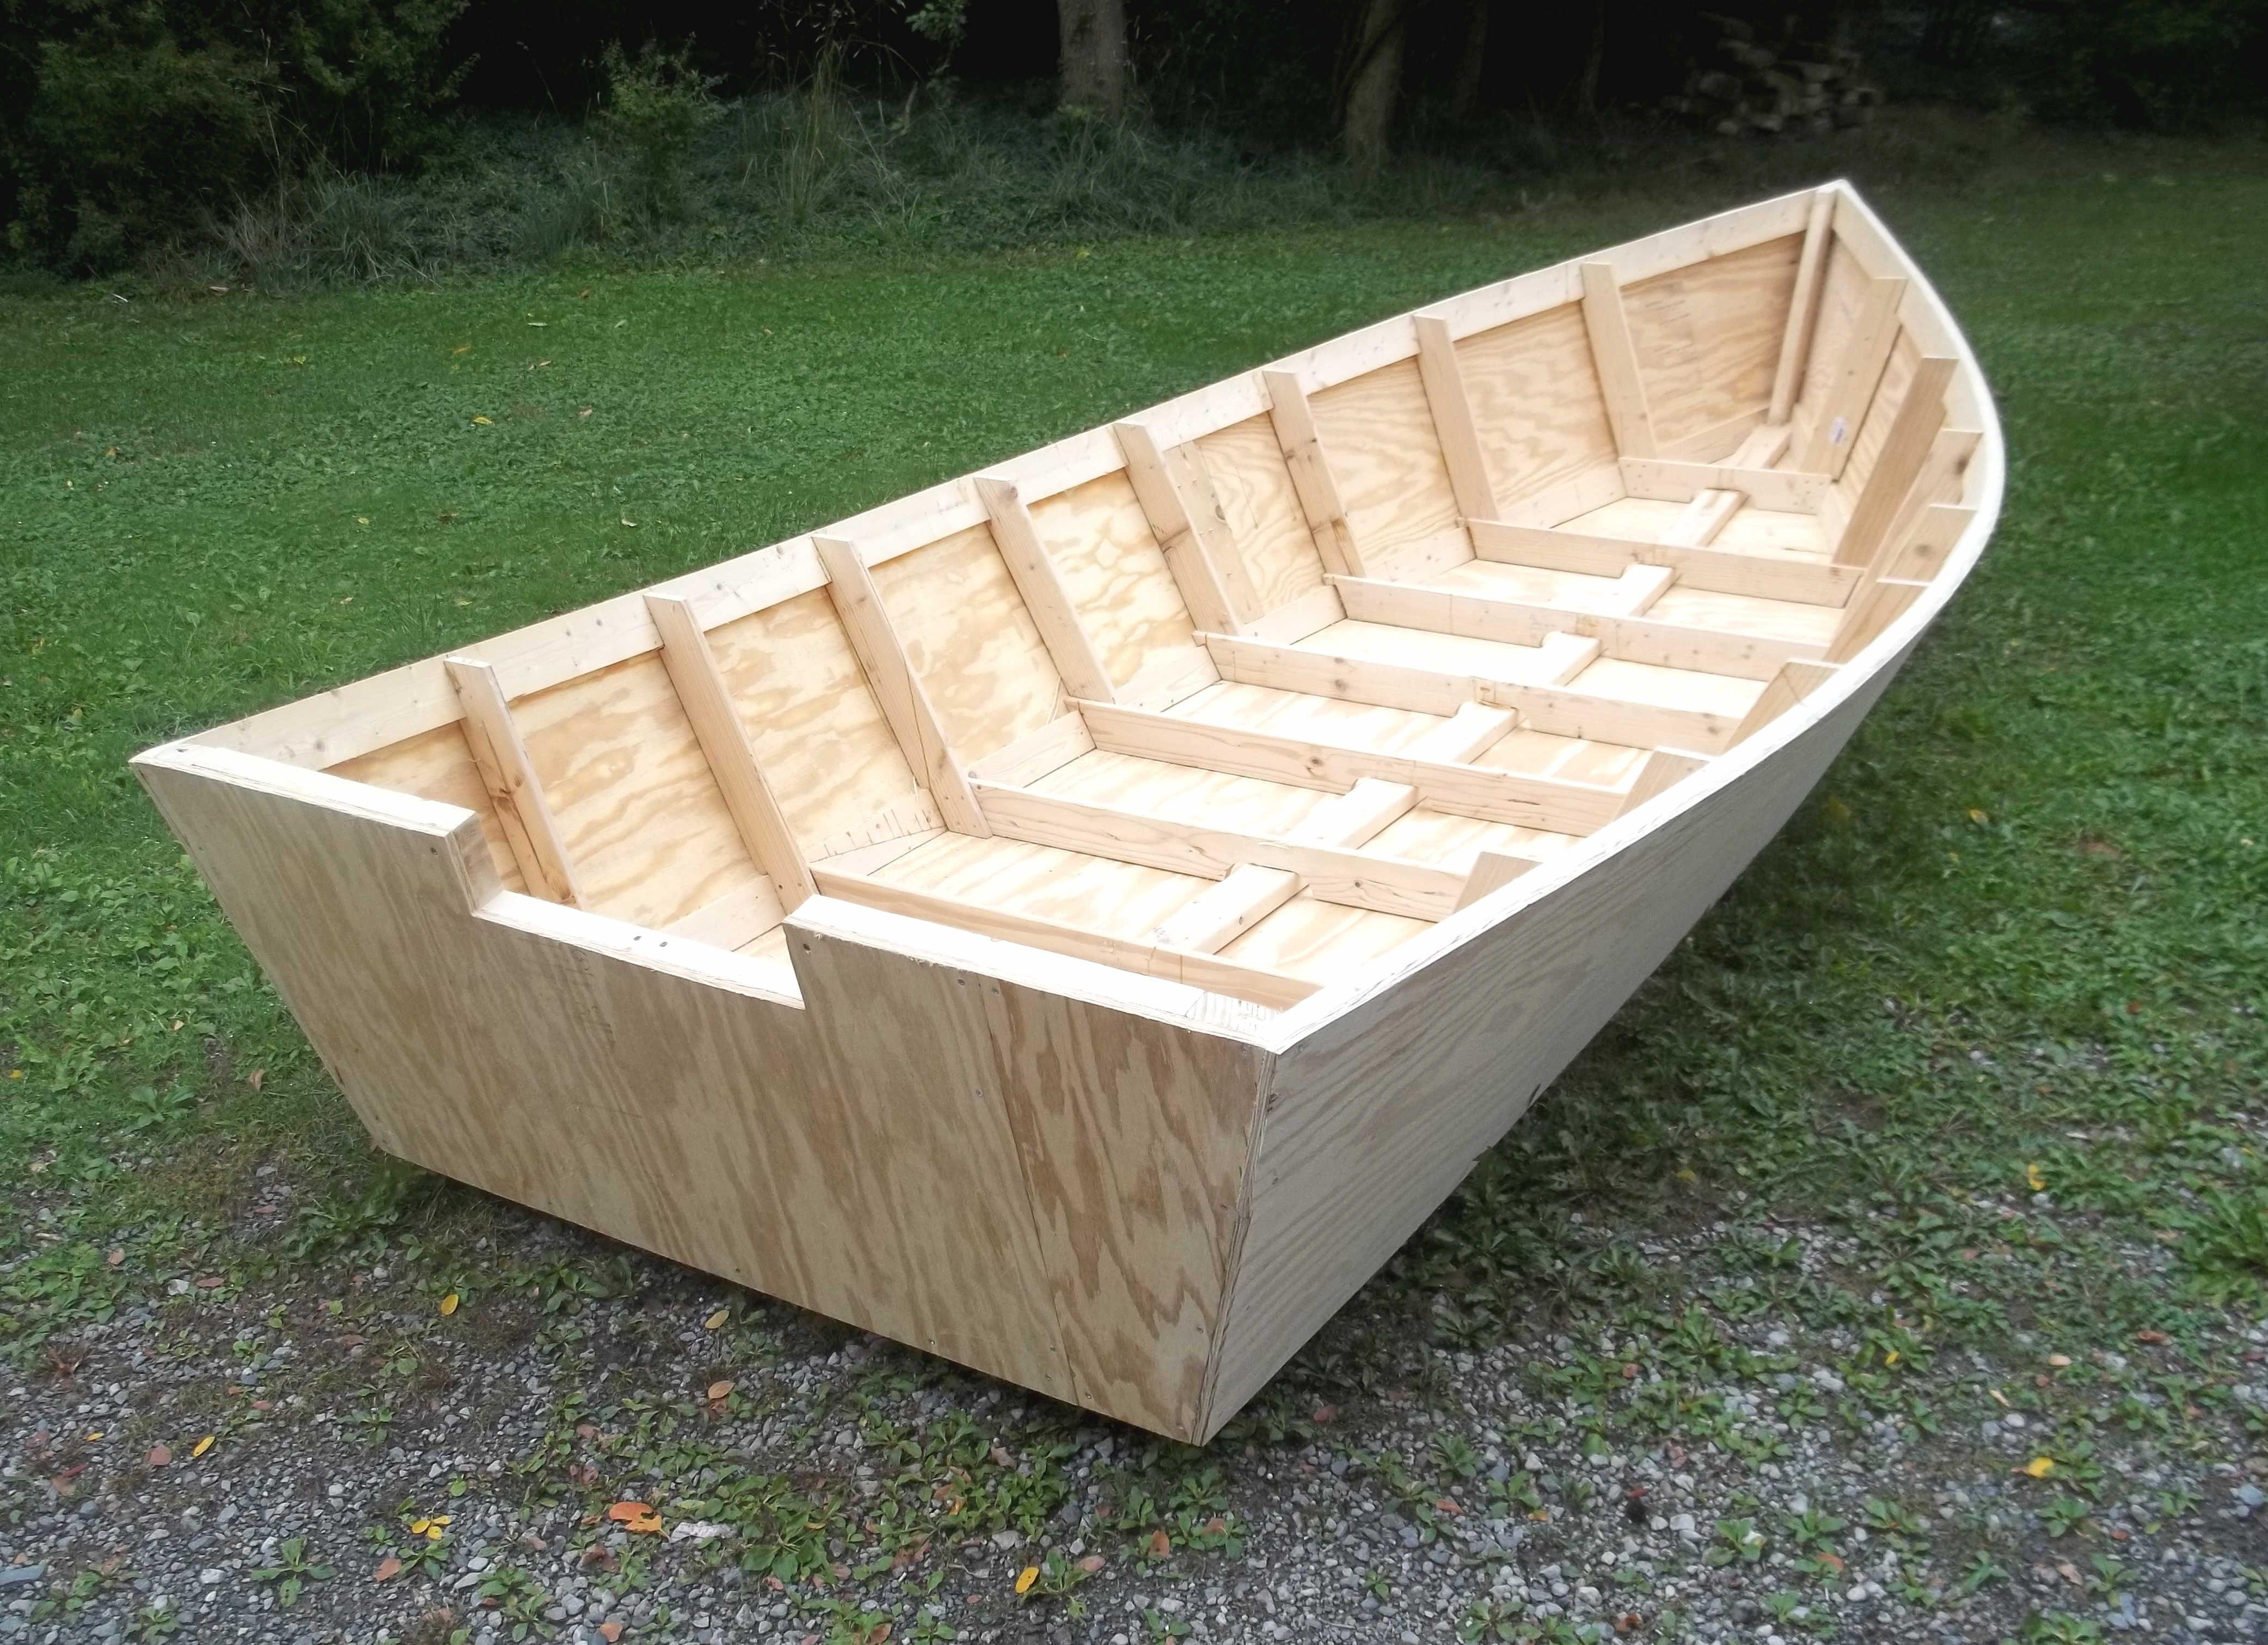 Erster Designs boat - Google Search | Small Boat, Paddle Board ...